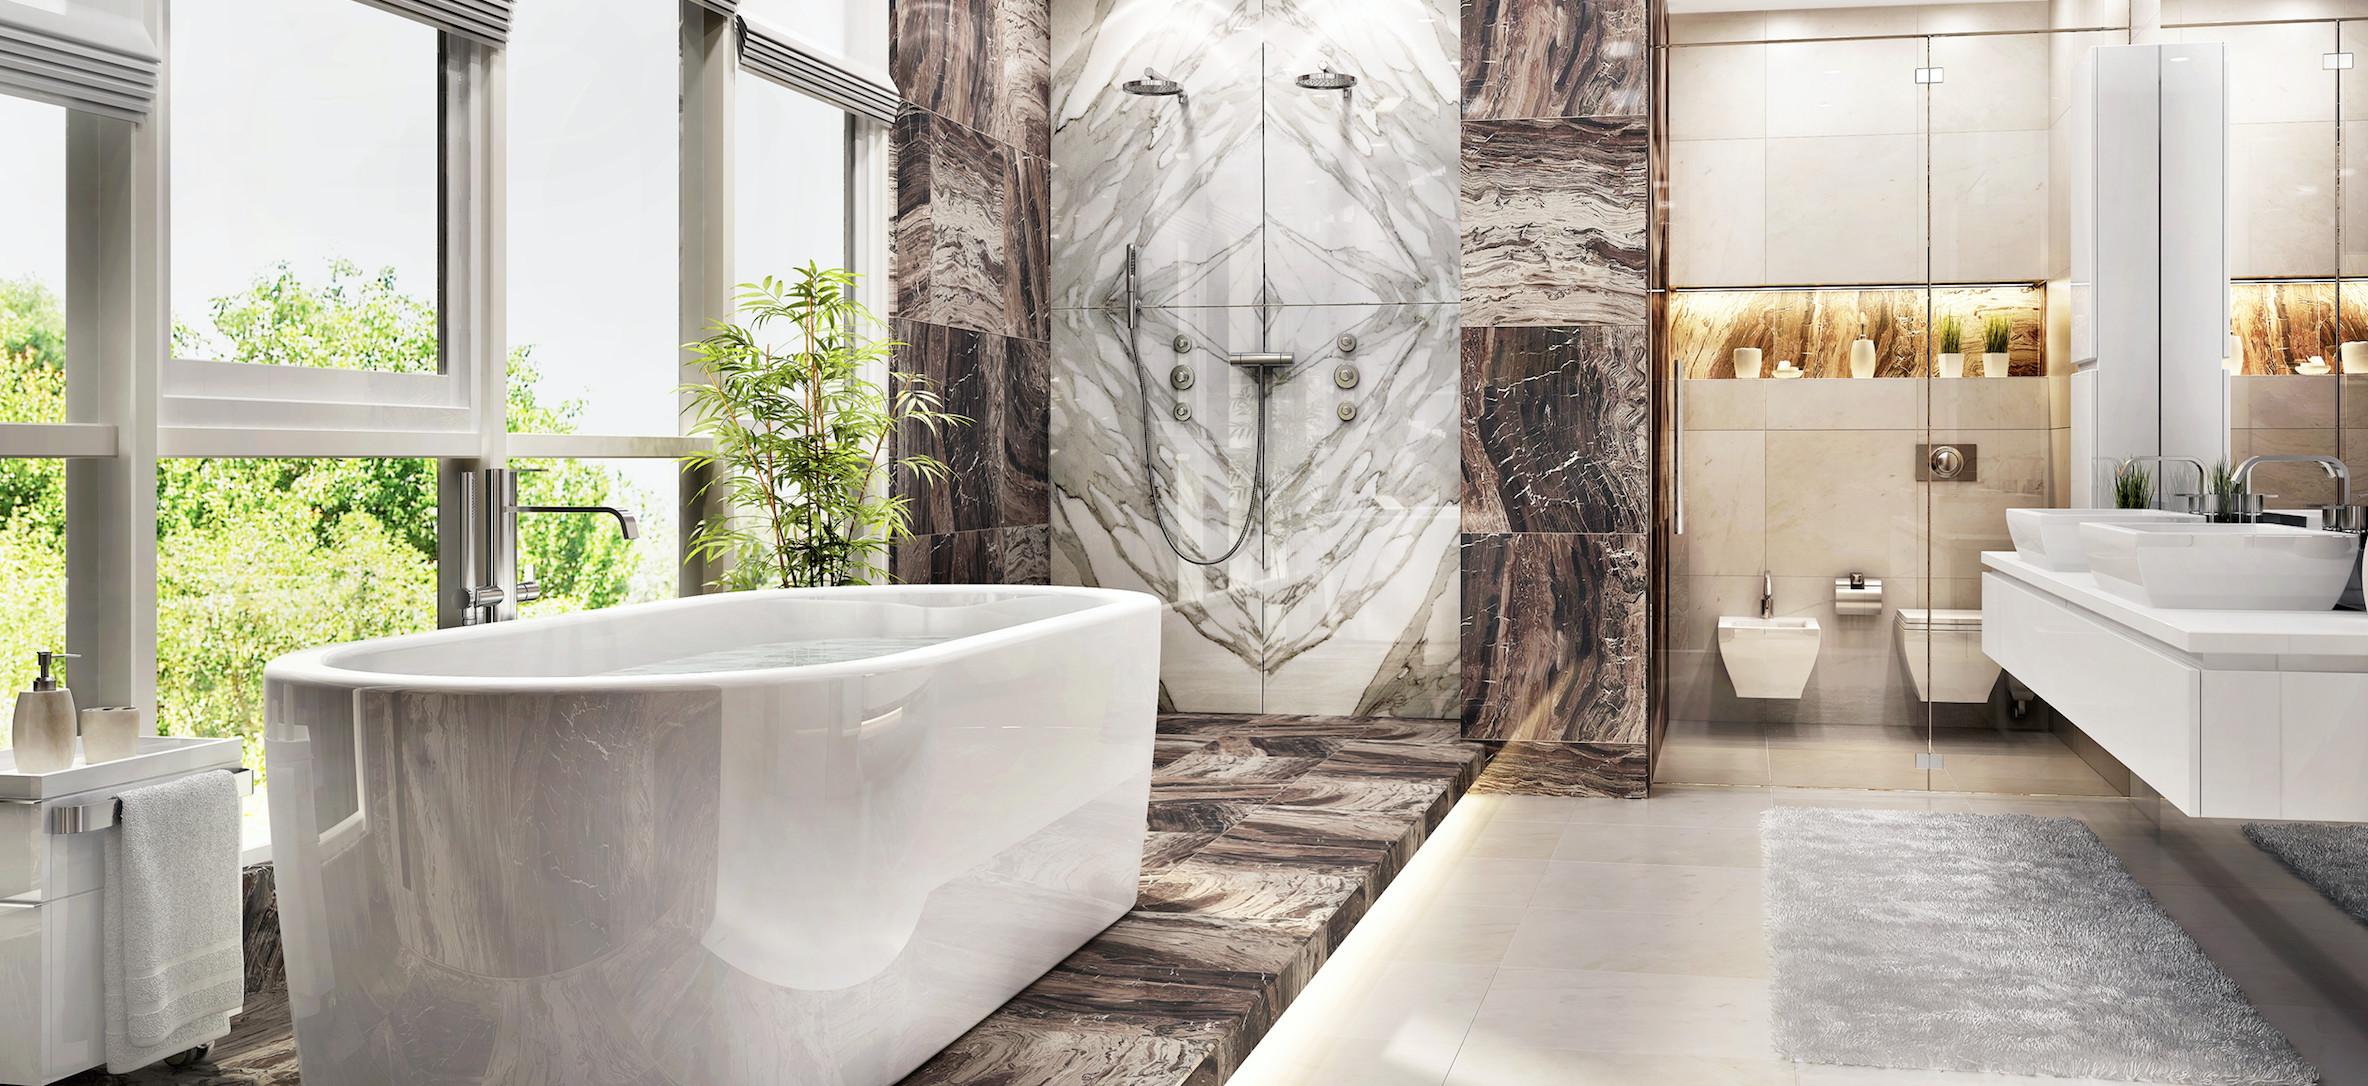 Master Bathroom Size  Size Matters Five Top Bathroom Trends